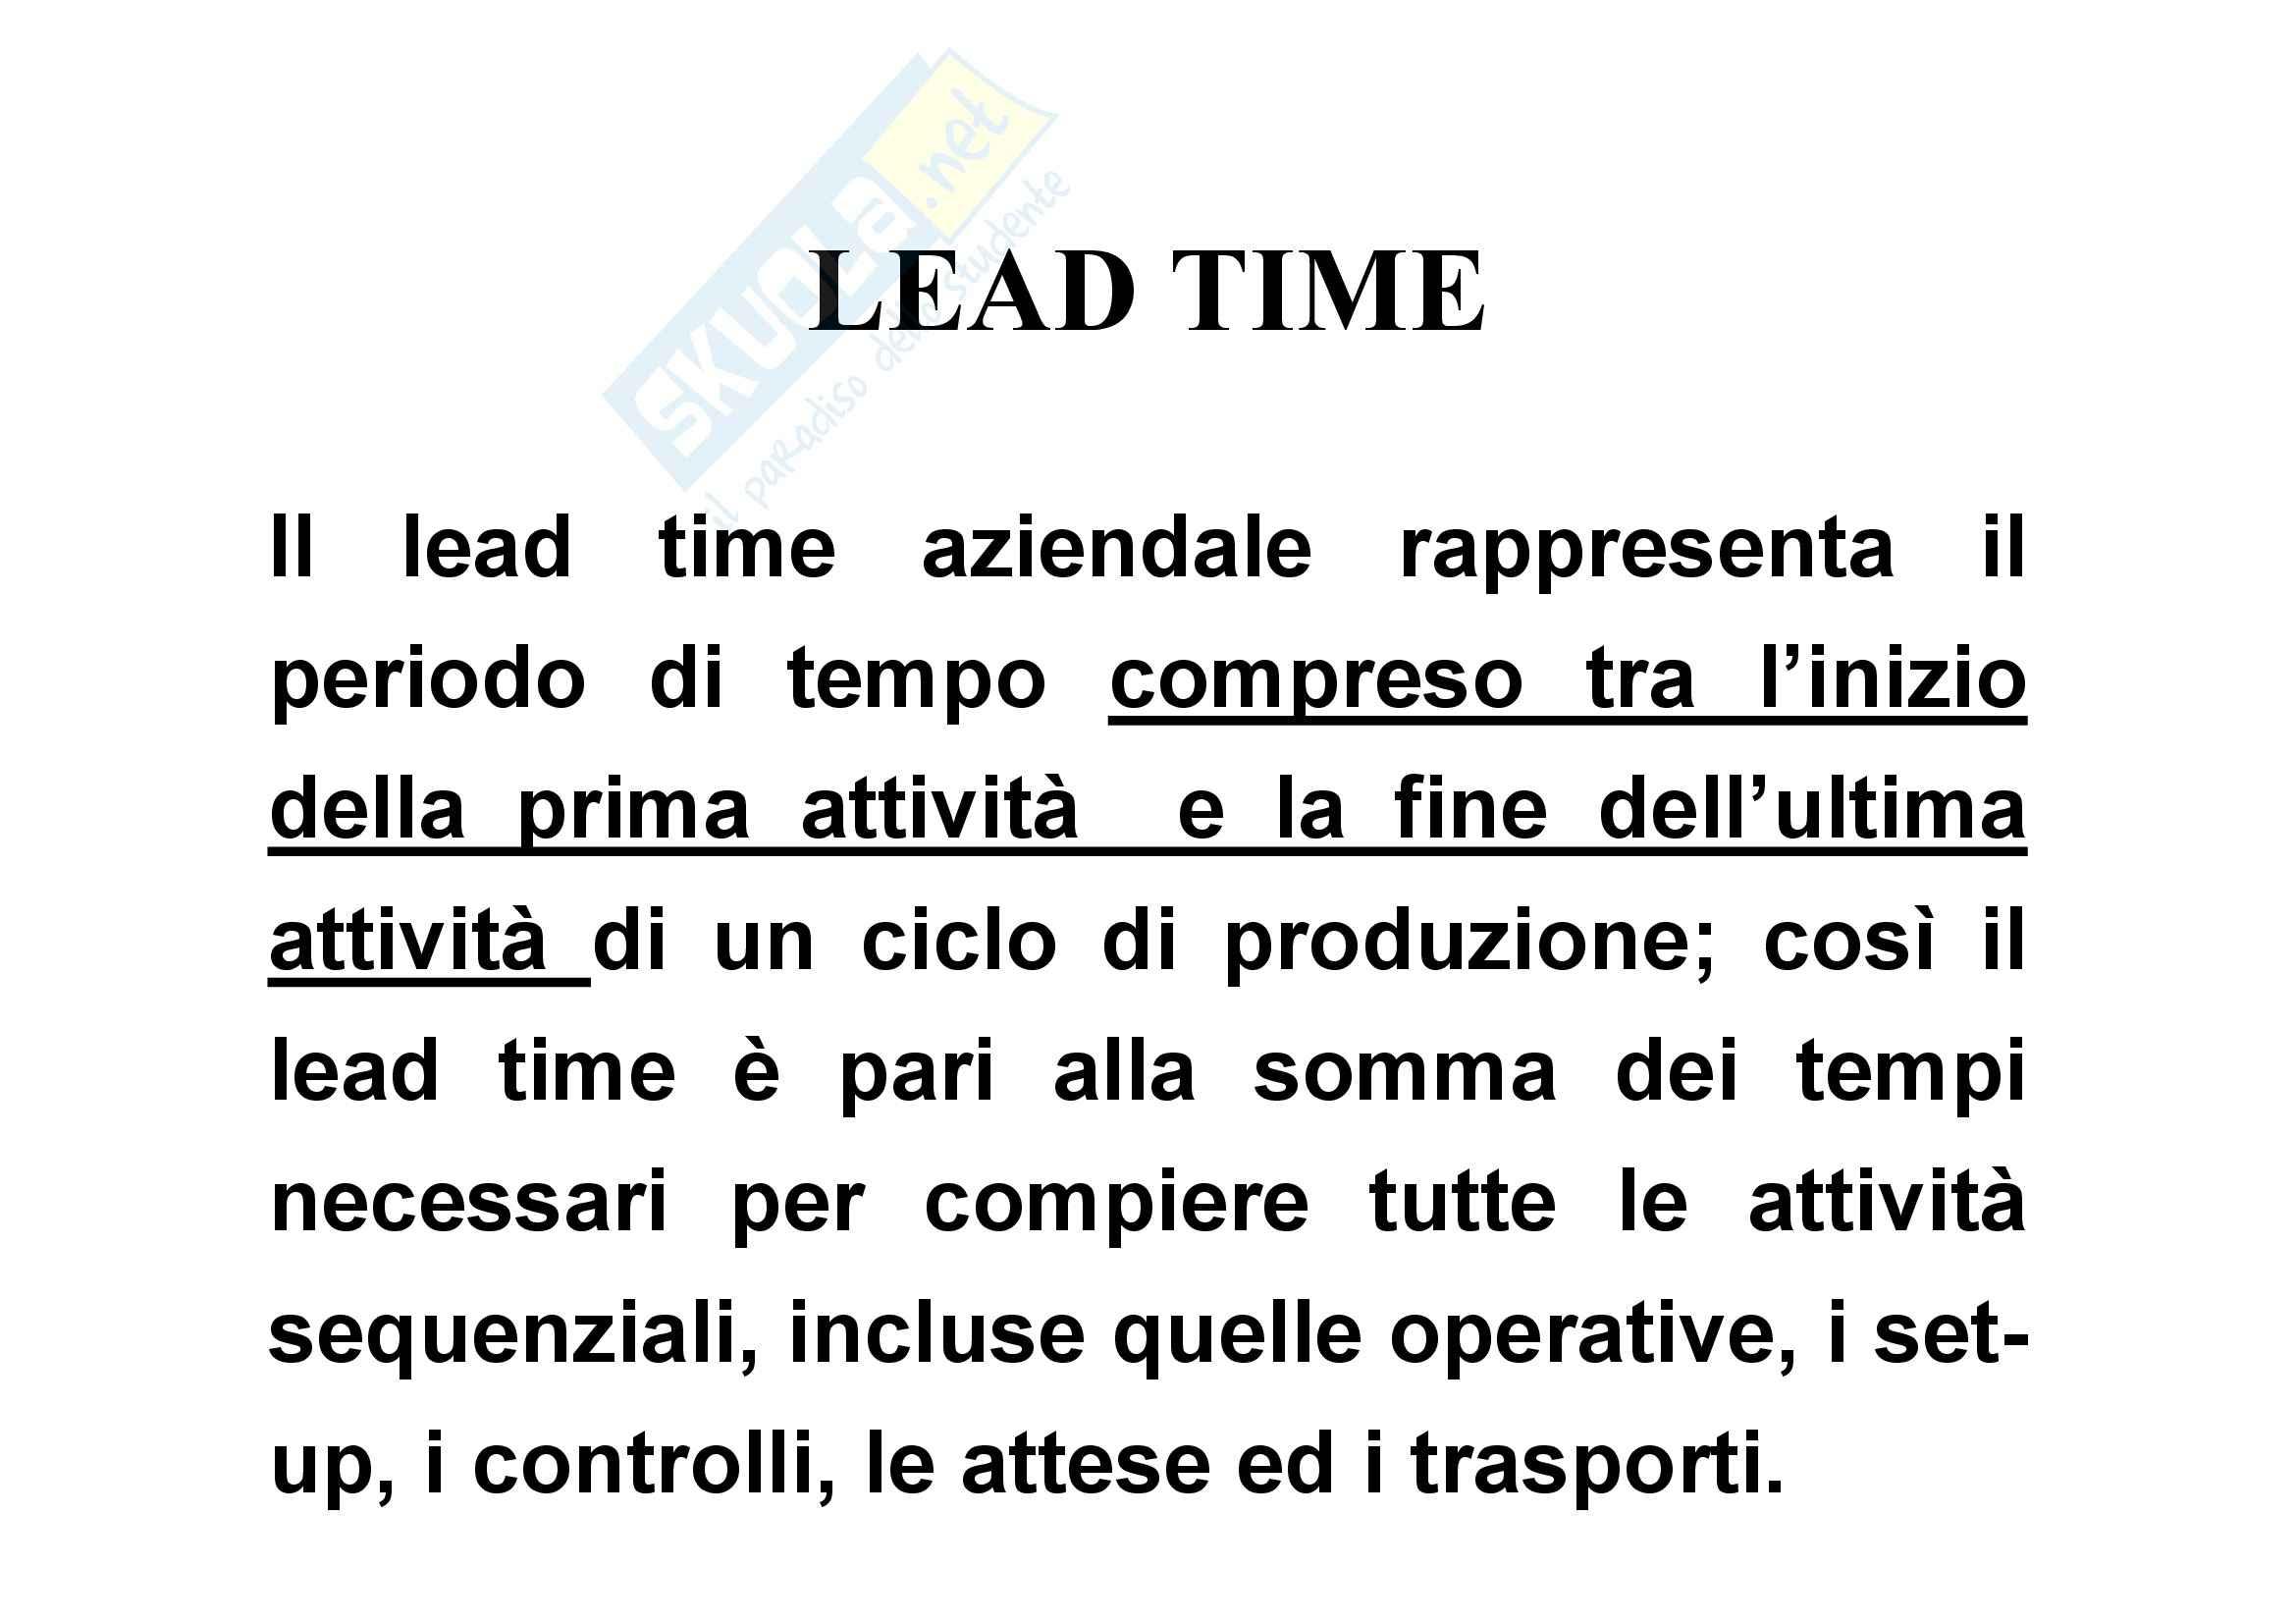 Tecnologia dei cicli produttivi - lead time